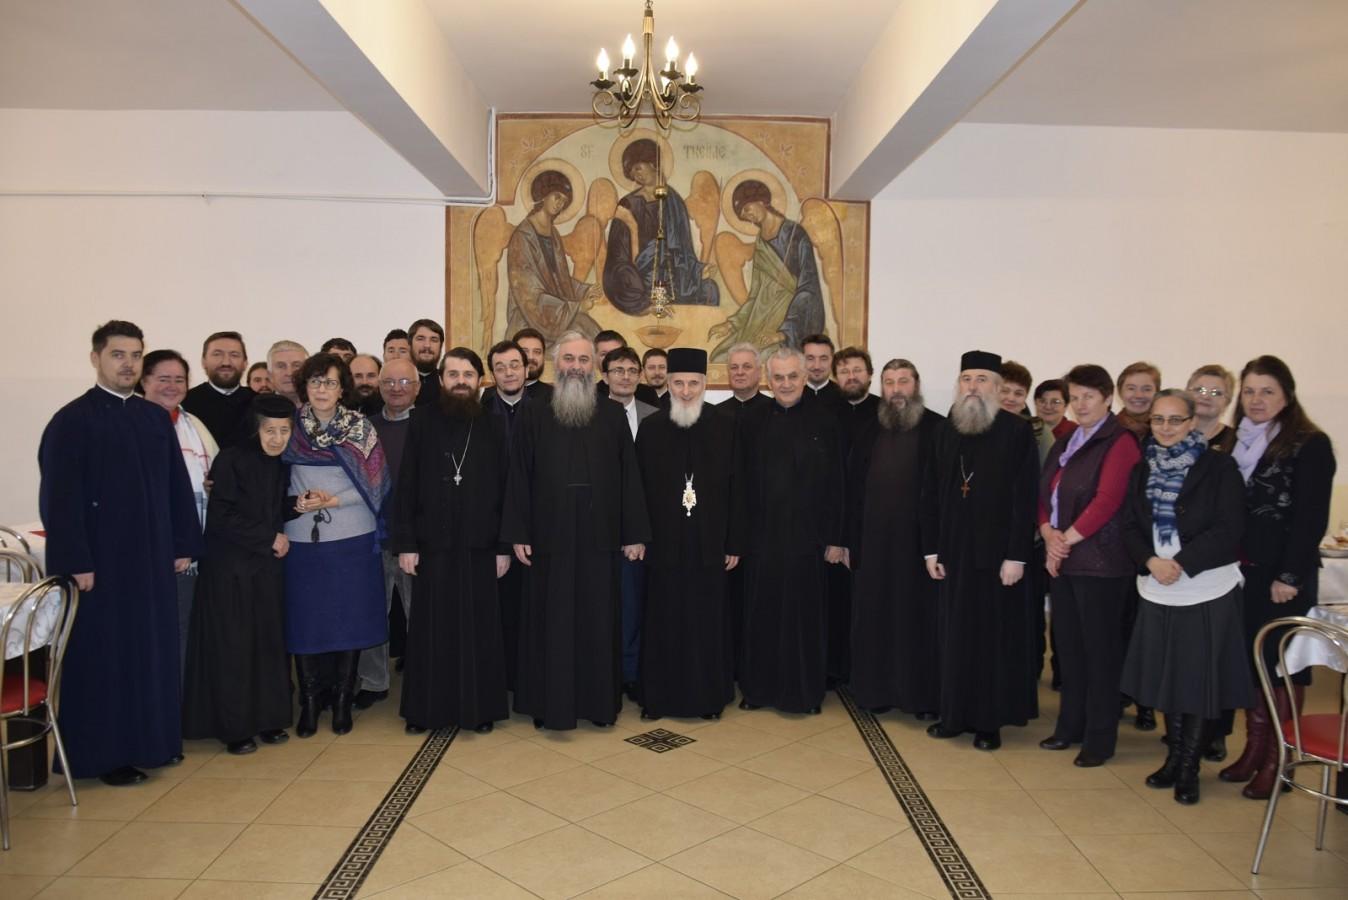 Preasfințitul Părinte Vasile, la ceas aniversar